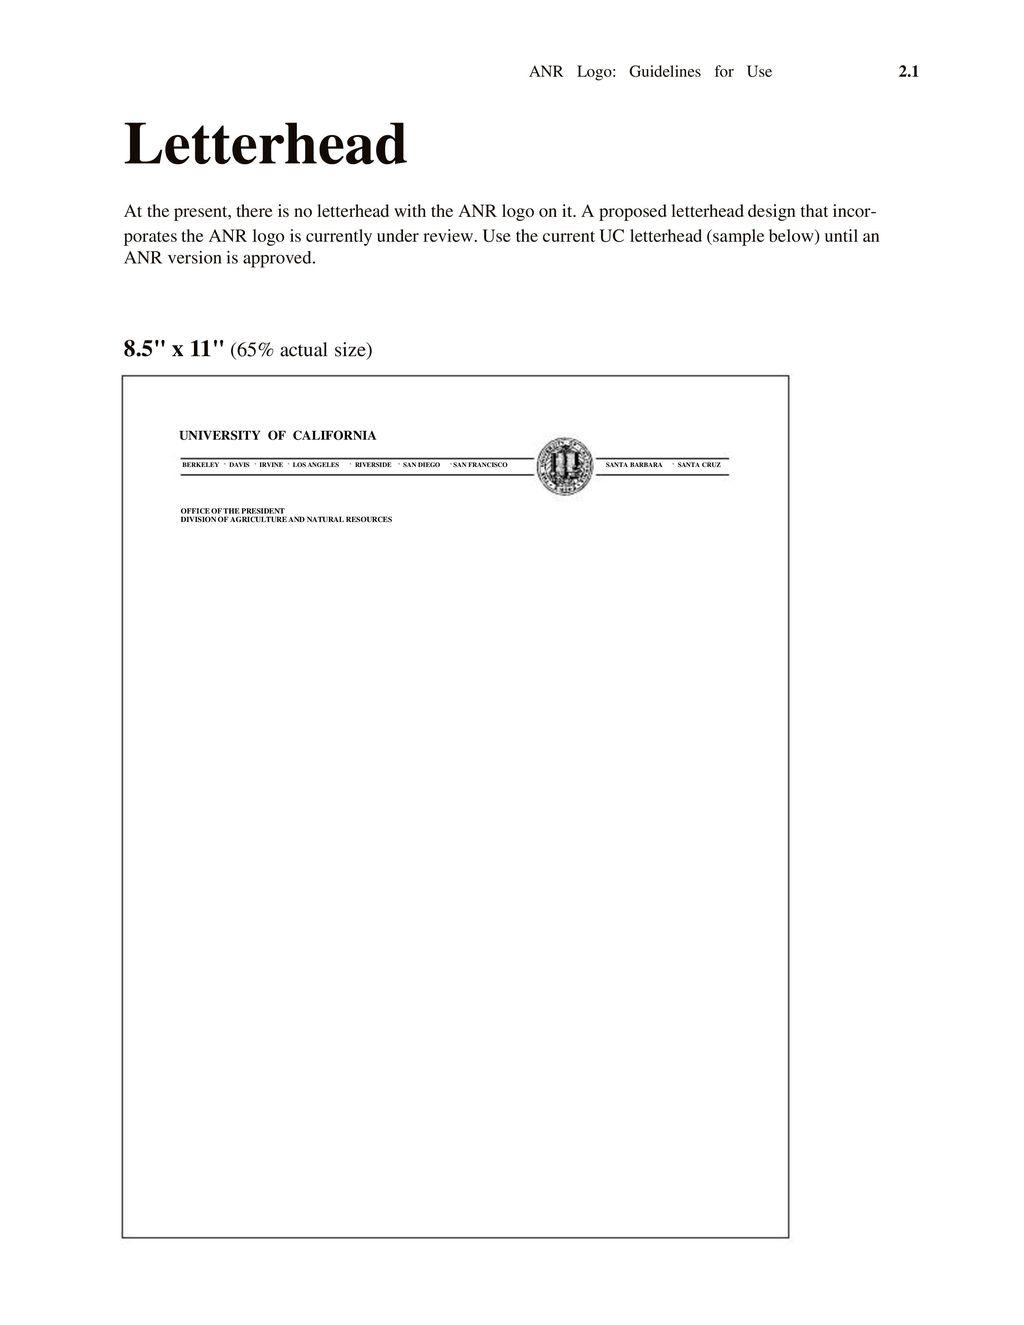 Anr logo guidelines for use university of california ppt download 14 letterhead university of california altavistaventures Gallery